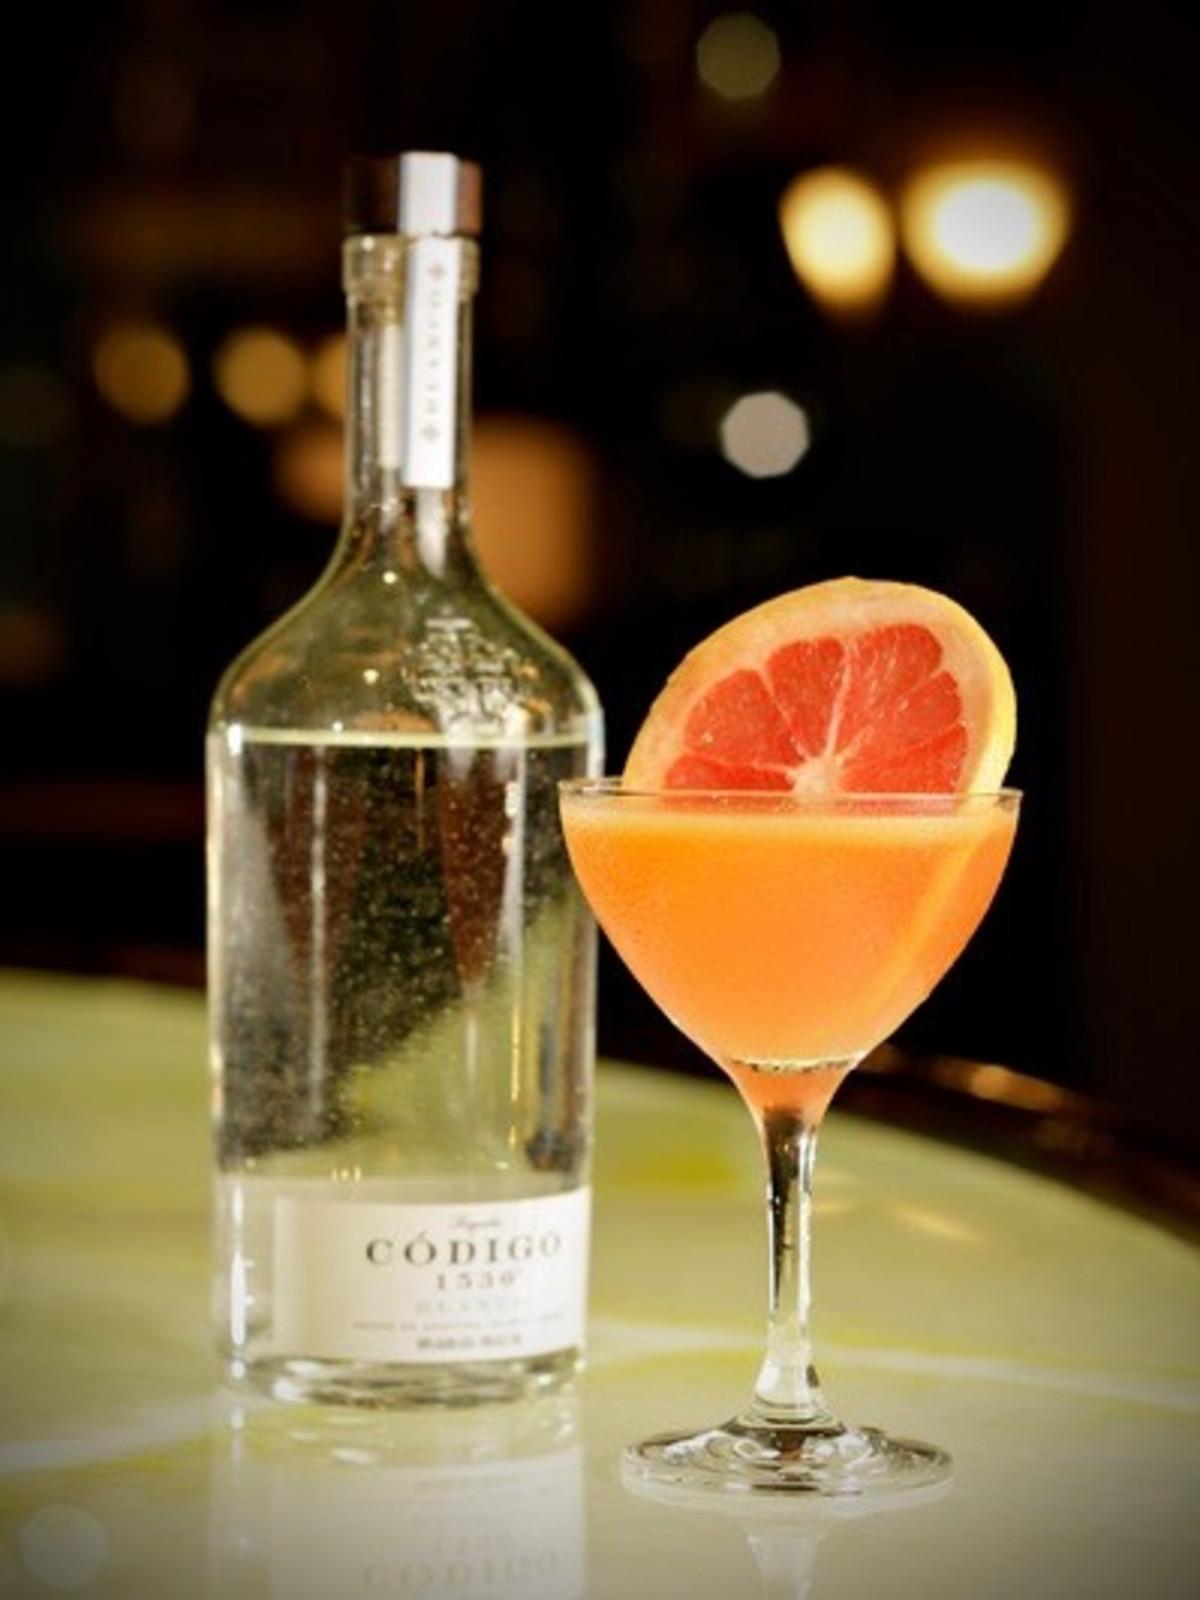 George Strait Codigo Tequila 2